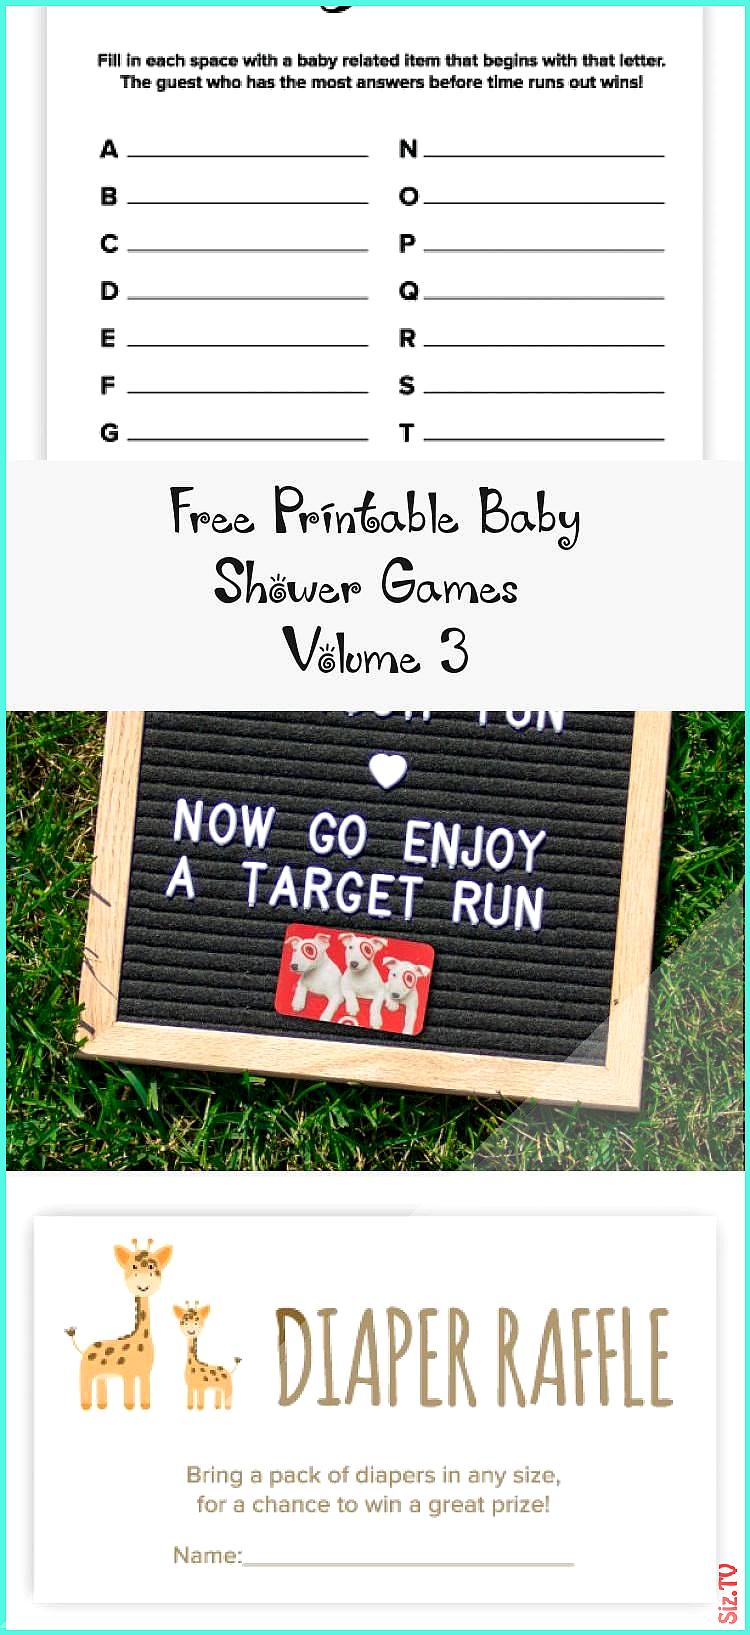 Free Printable Baby Shower Games Volume 3 Free Printable Baby Shower Games Volume 3 dea idea2463 Babyshower deas Free Printable Baby Shower Games Volume 3 nbsp hellip Bab...